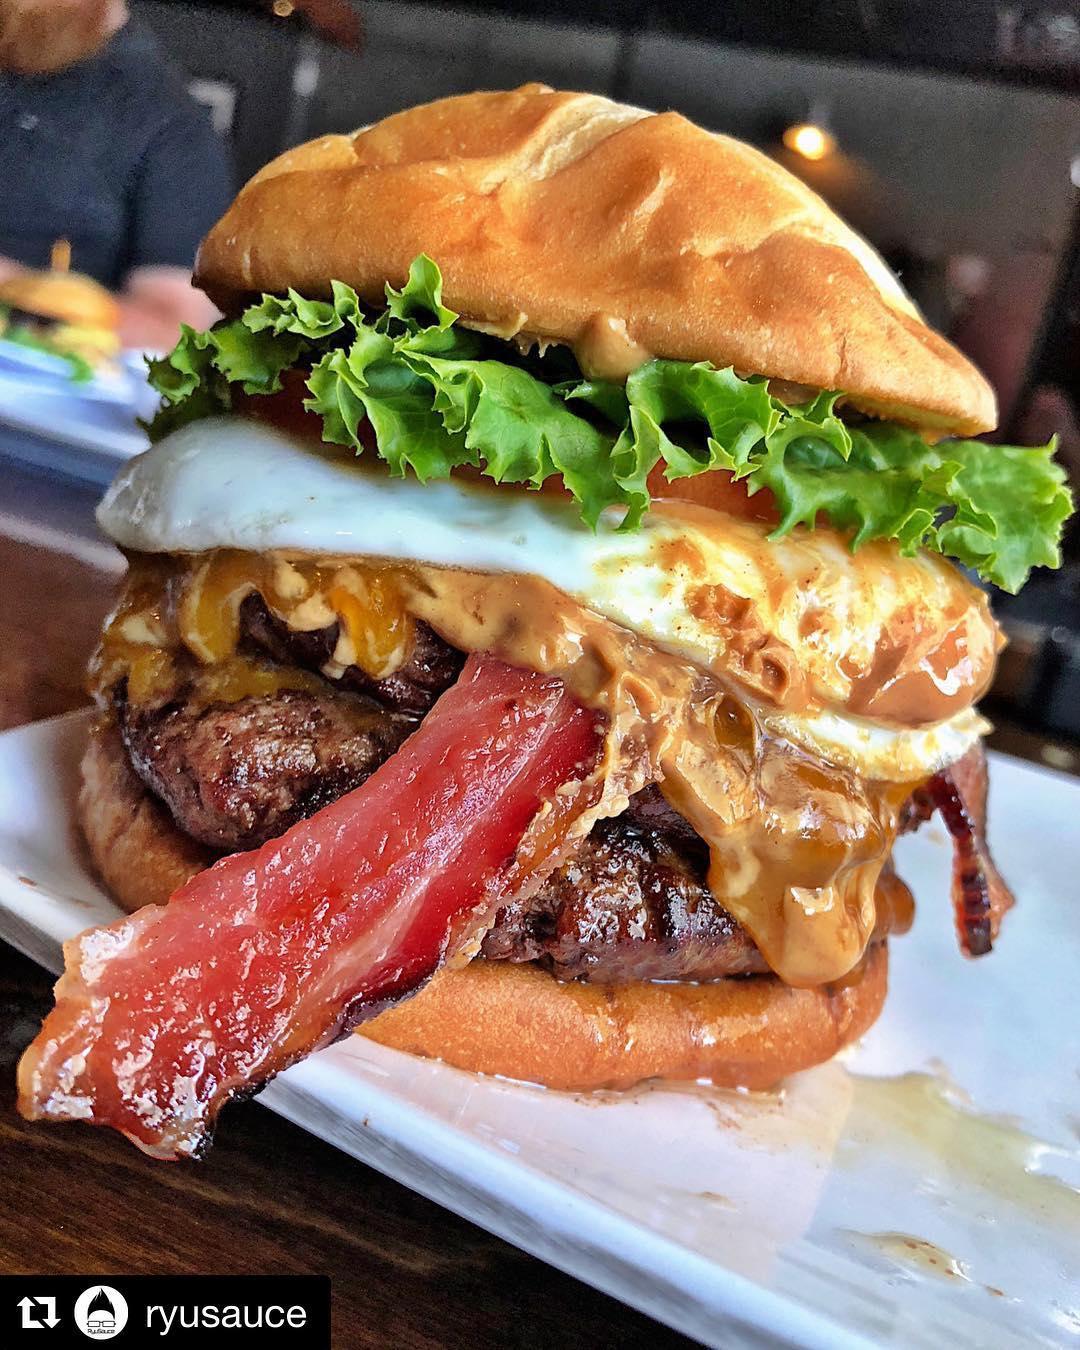 A burger at The Dillinger